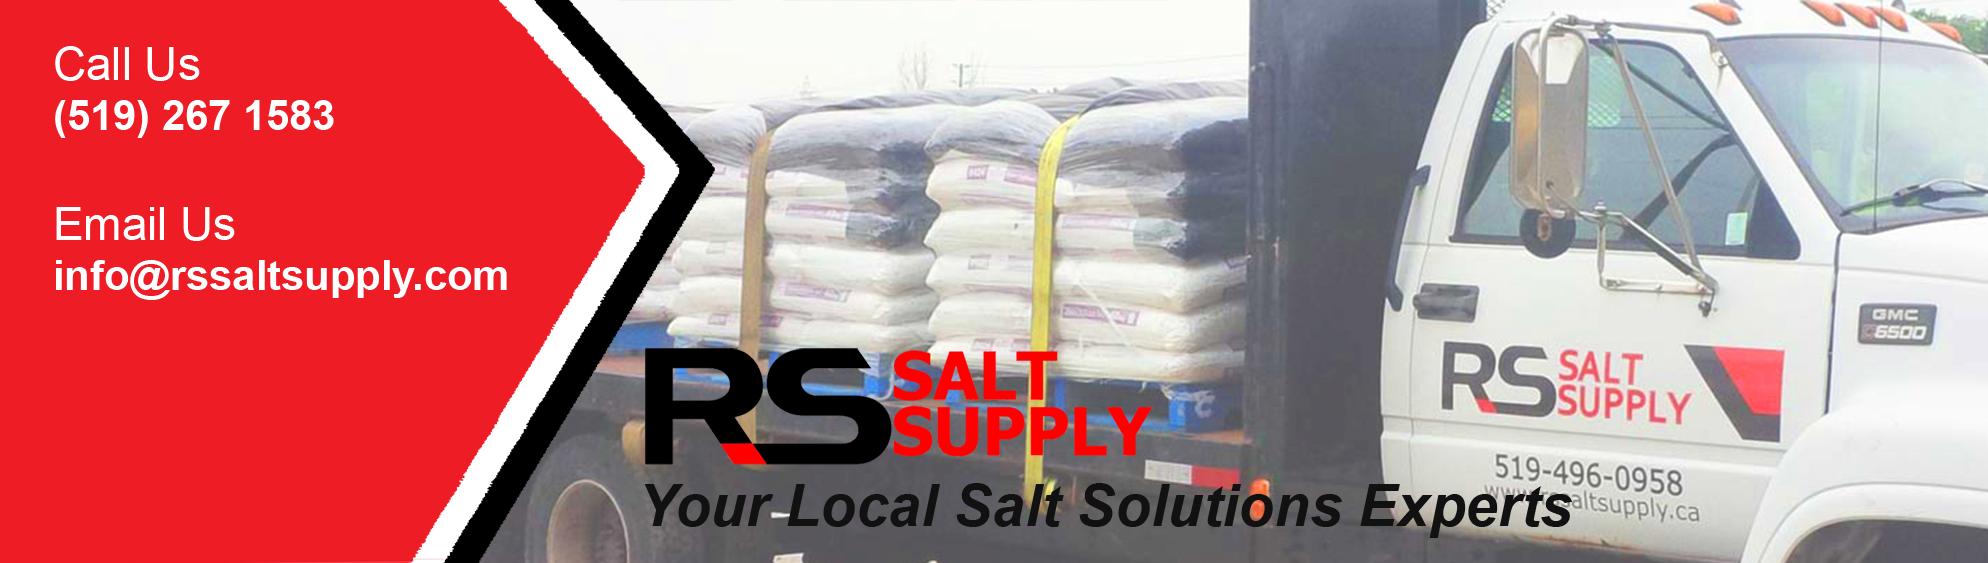 Home - RS Salt Supply